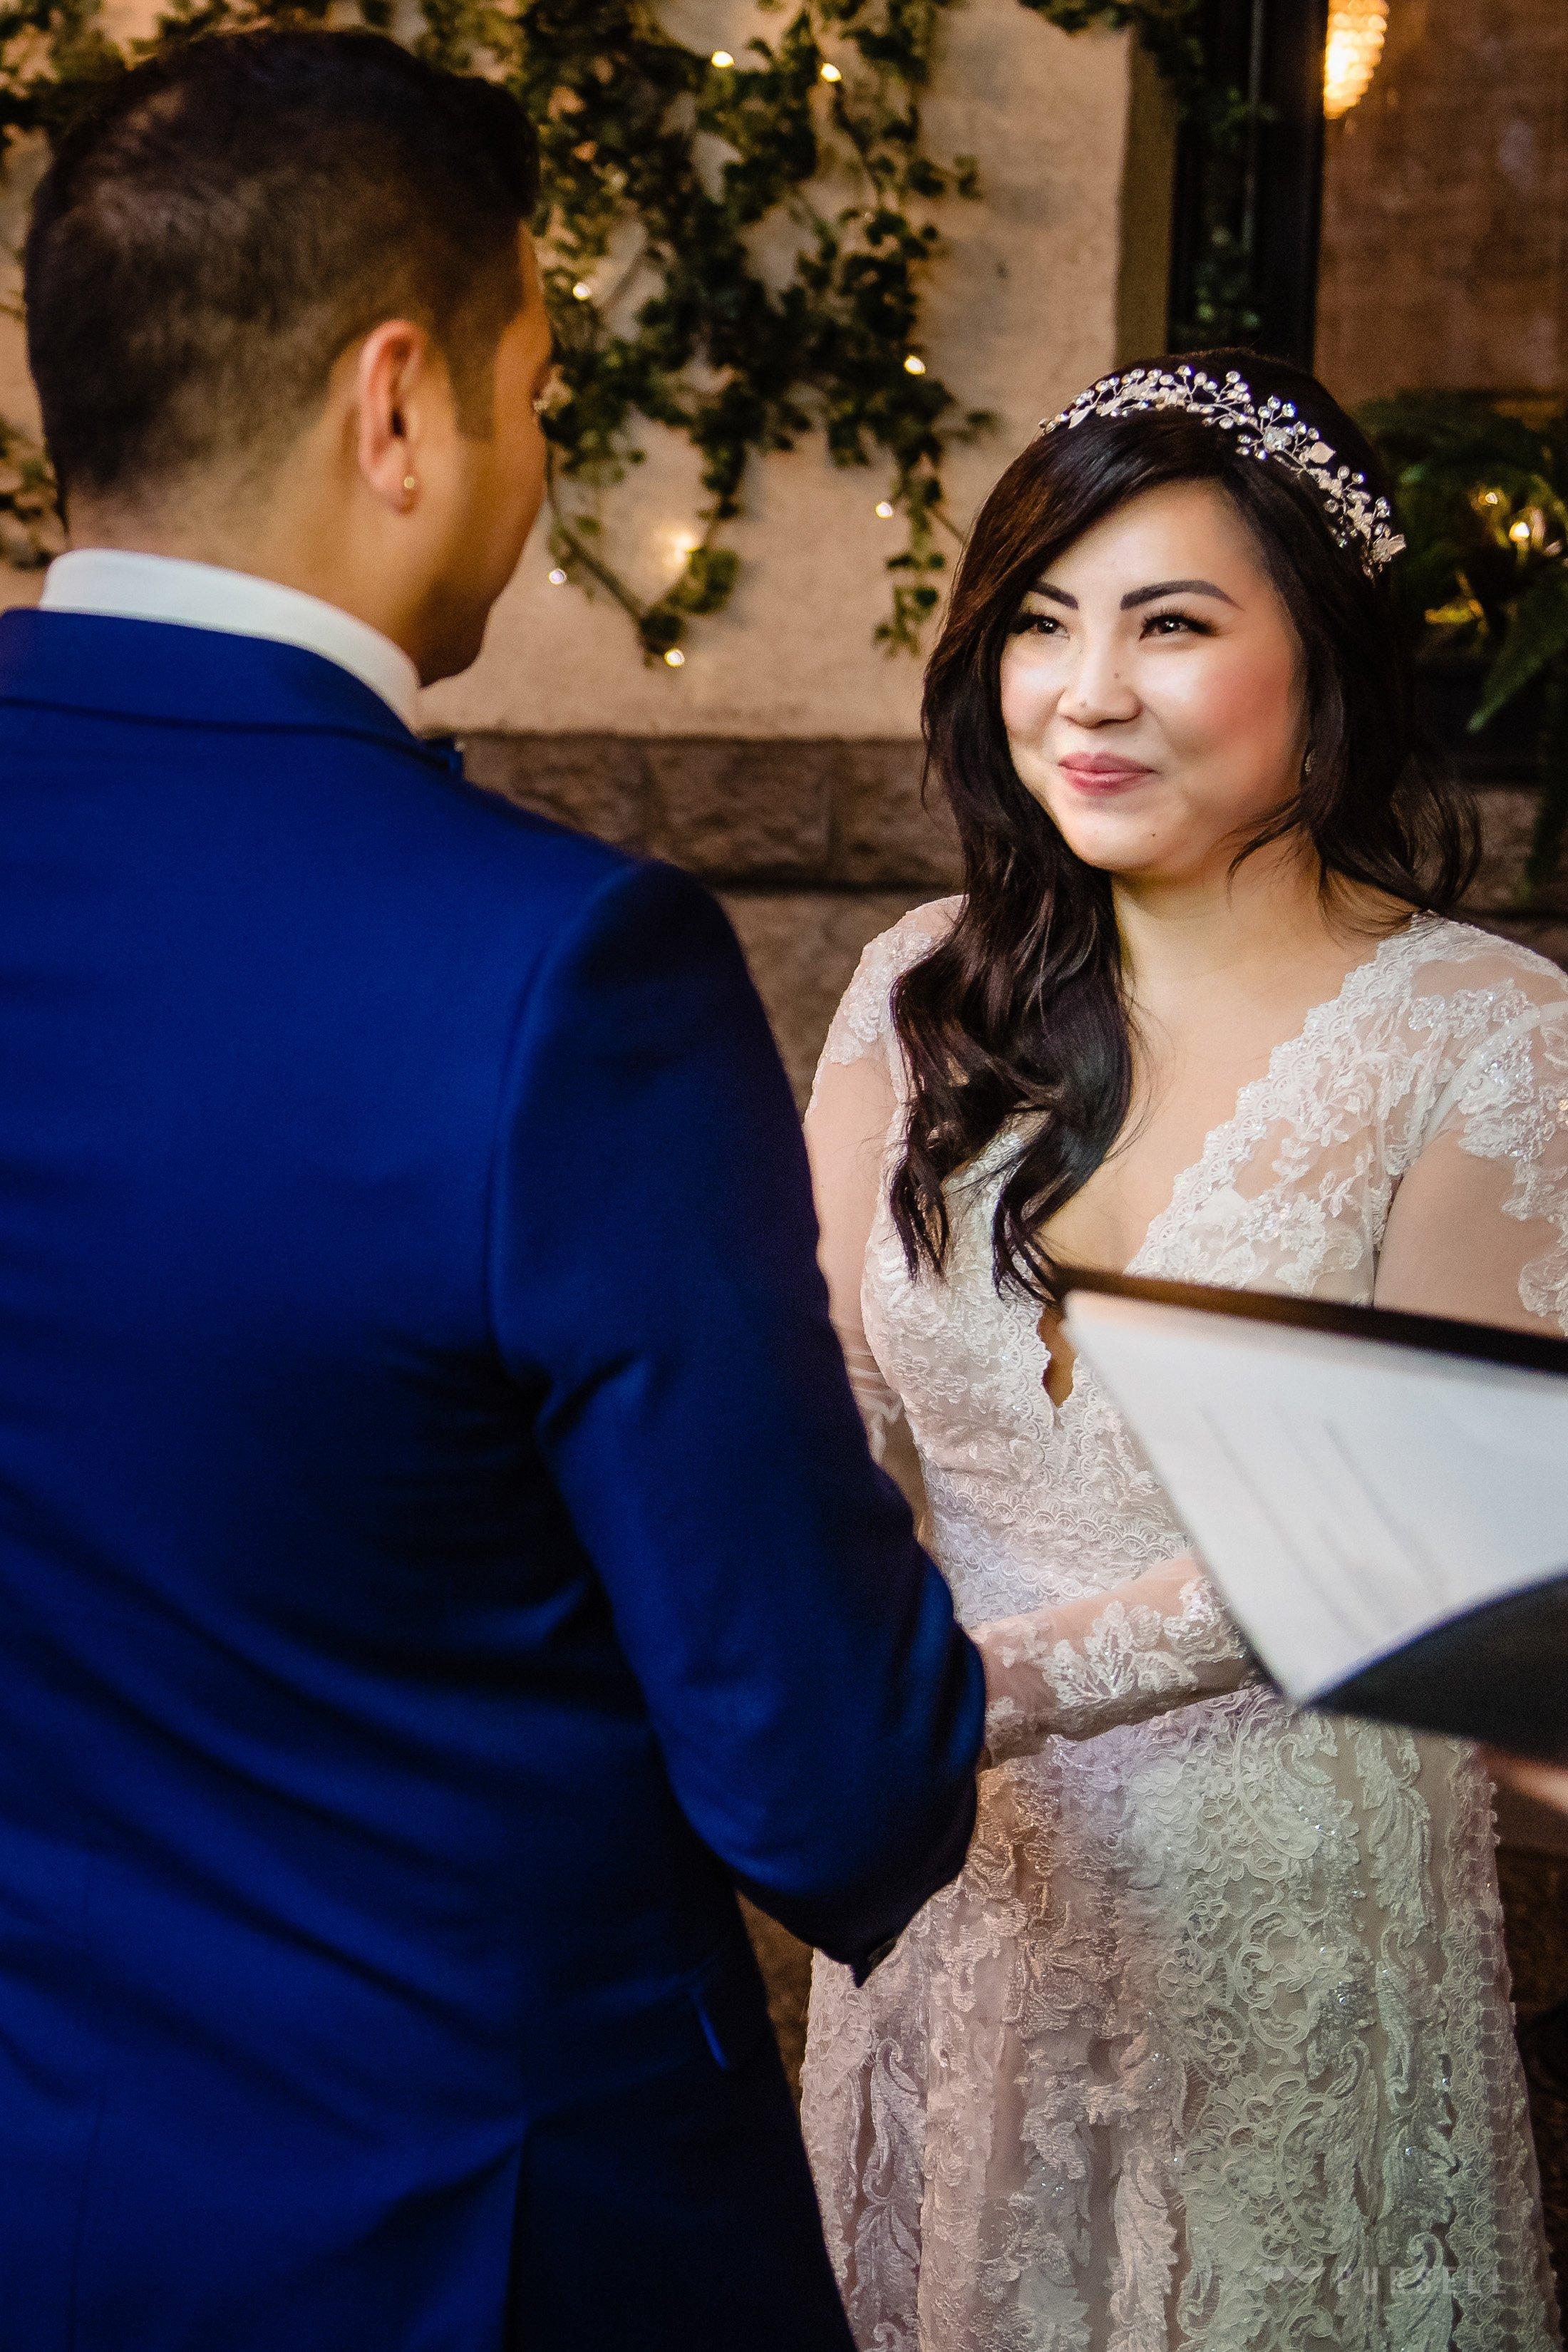 010 - brix and mortar wedding ceremony